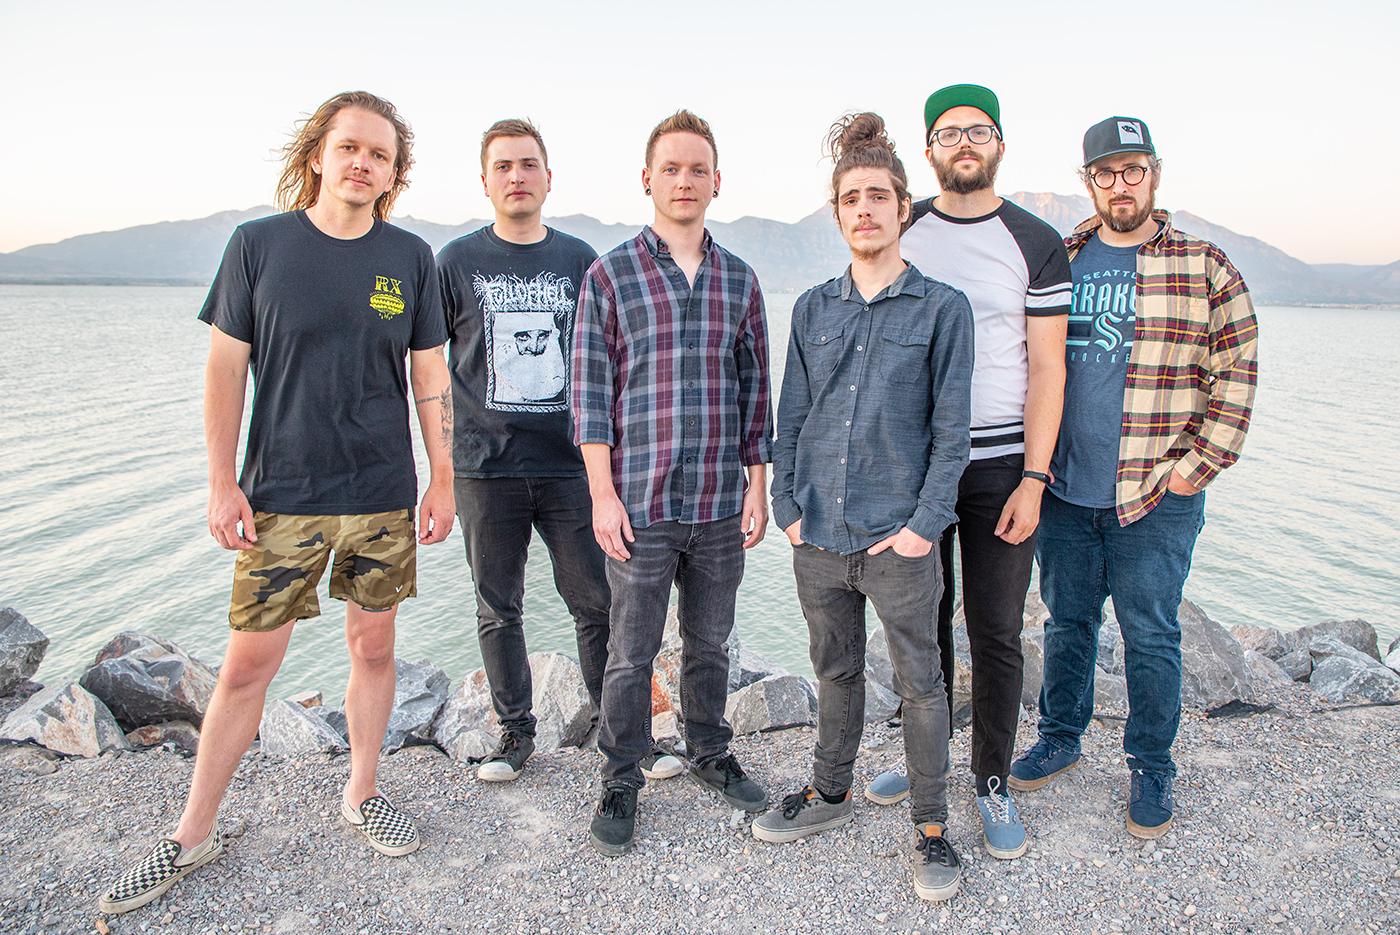 (L–R) Jason Bohman, Evan Wharton, Derek Harman, Tyler Webb, Jake Bills and Myles Lawrence of The Anchorage.